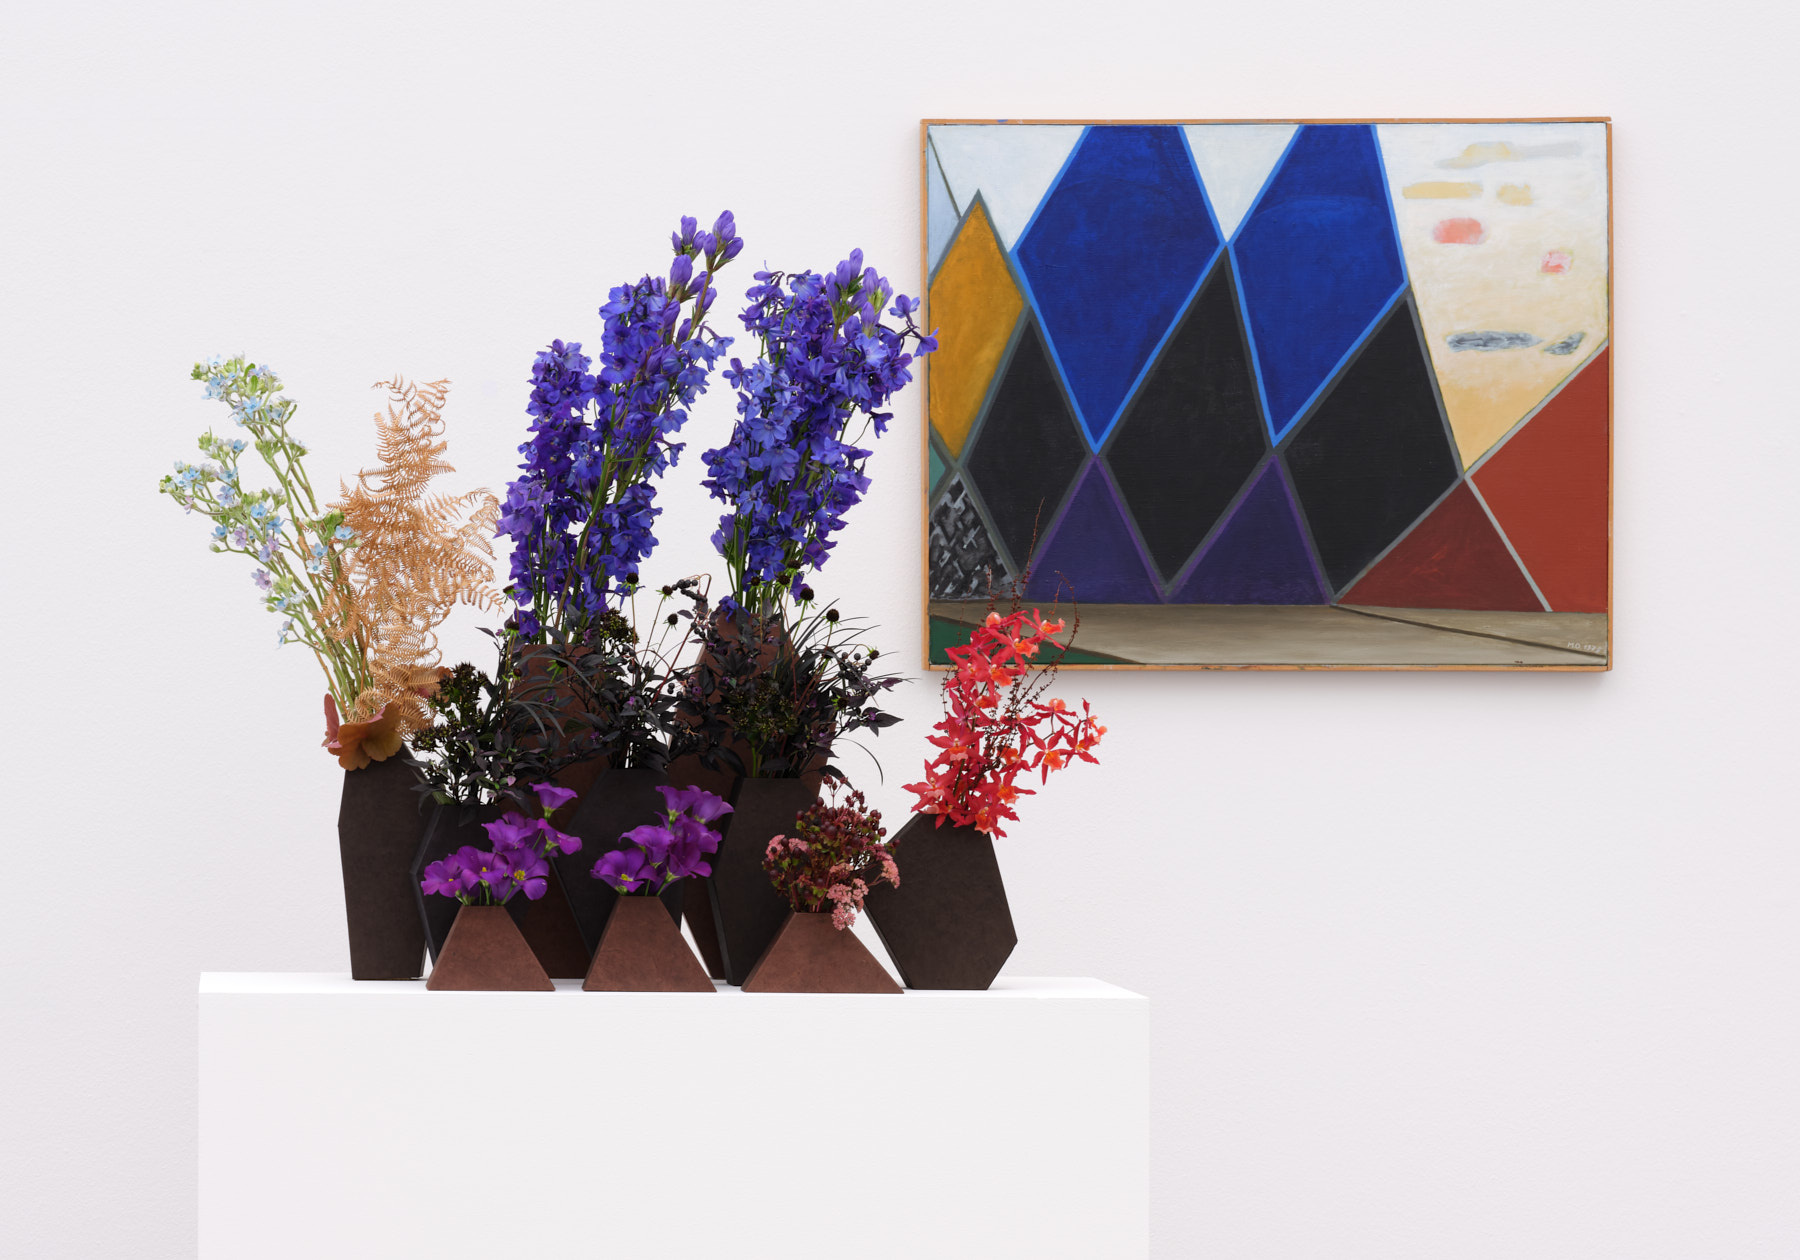 Ausstellung 2020 Flowers To Arts